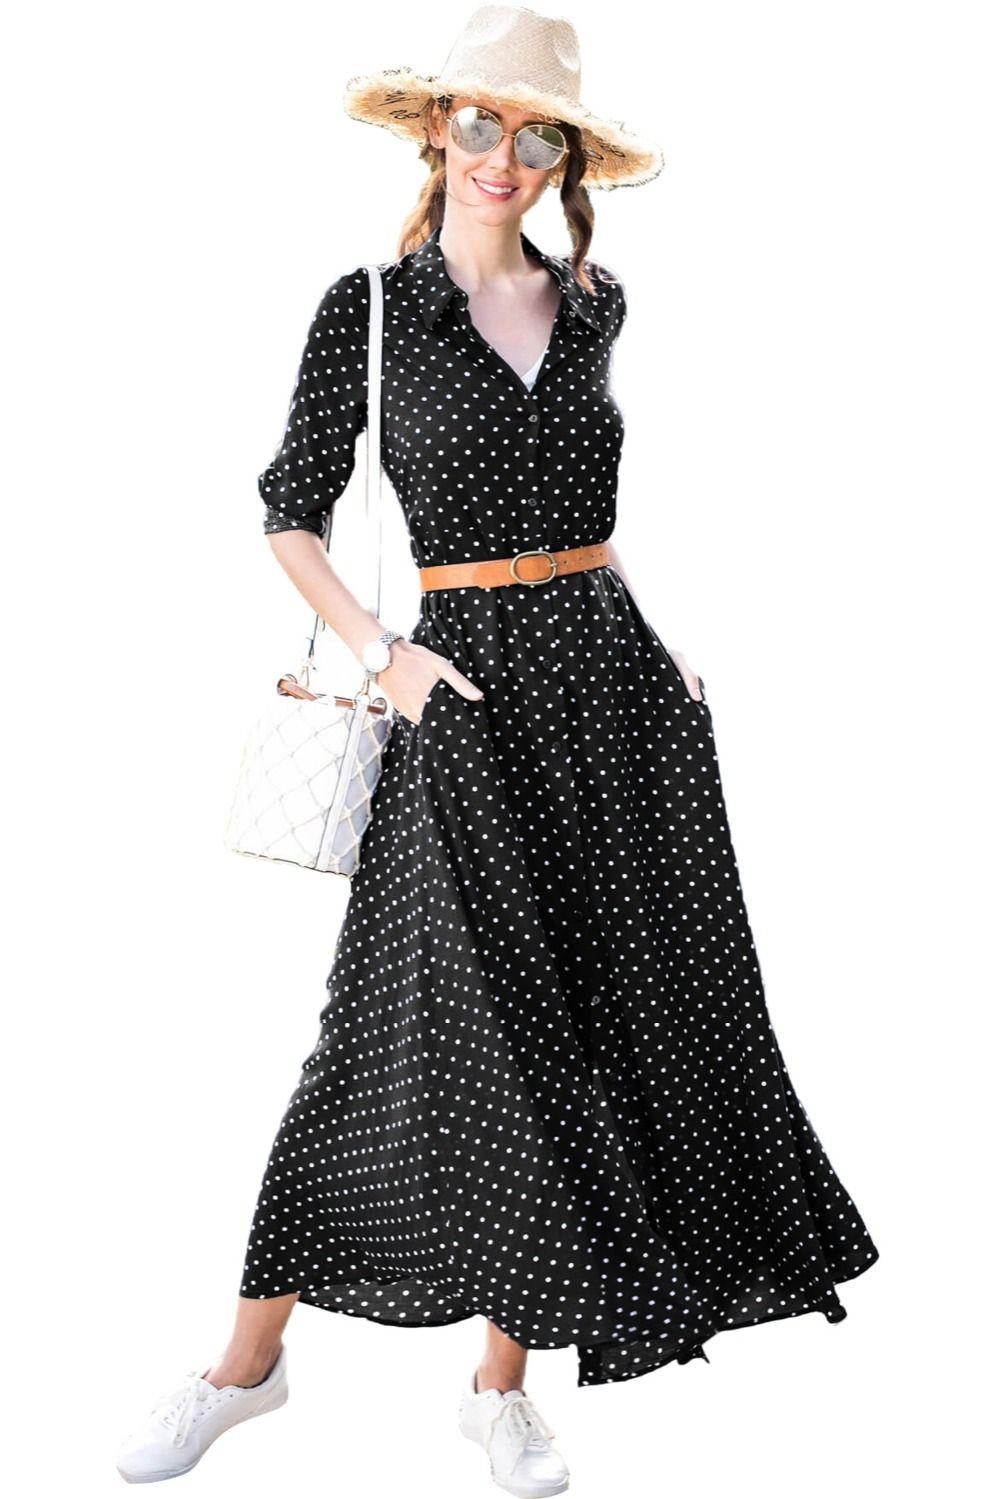 3df5470e11 New Autumn Long Sleeve Long Dresses Women Black Polka Dot Button Down V  Neck Maxi Shirt Dress With Belt Vestidos LC610335 Knit Dresses For Women  Dress ...